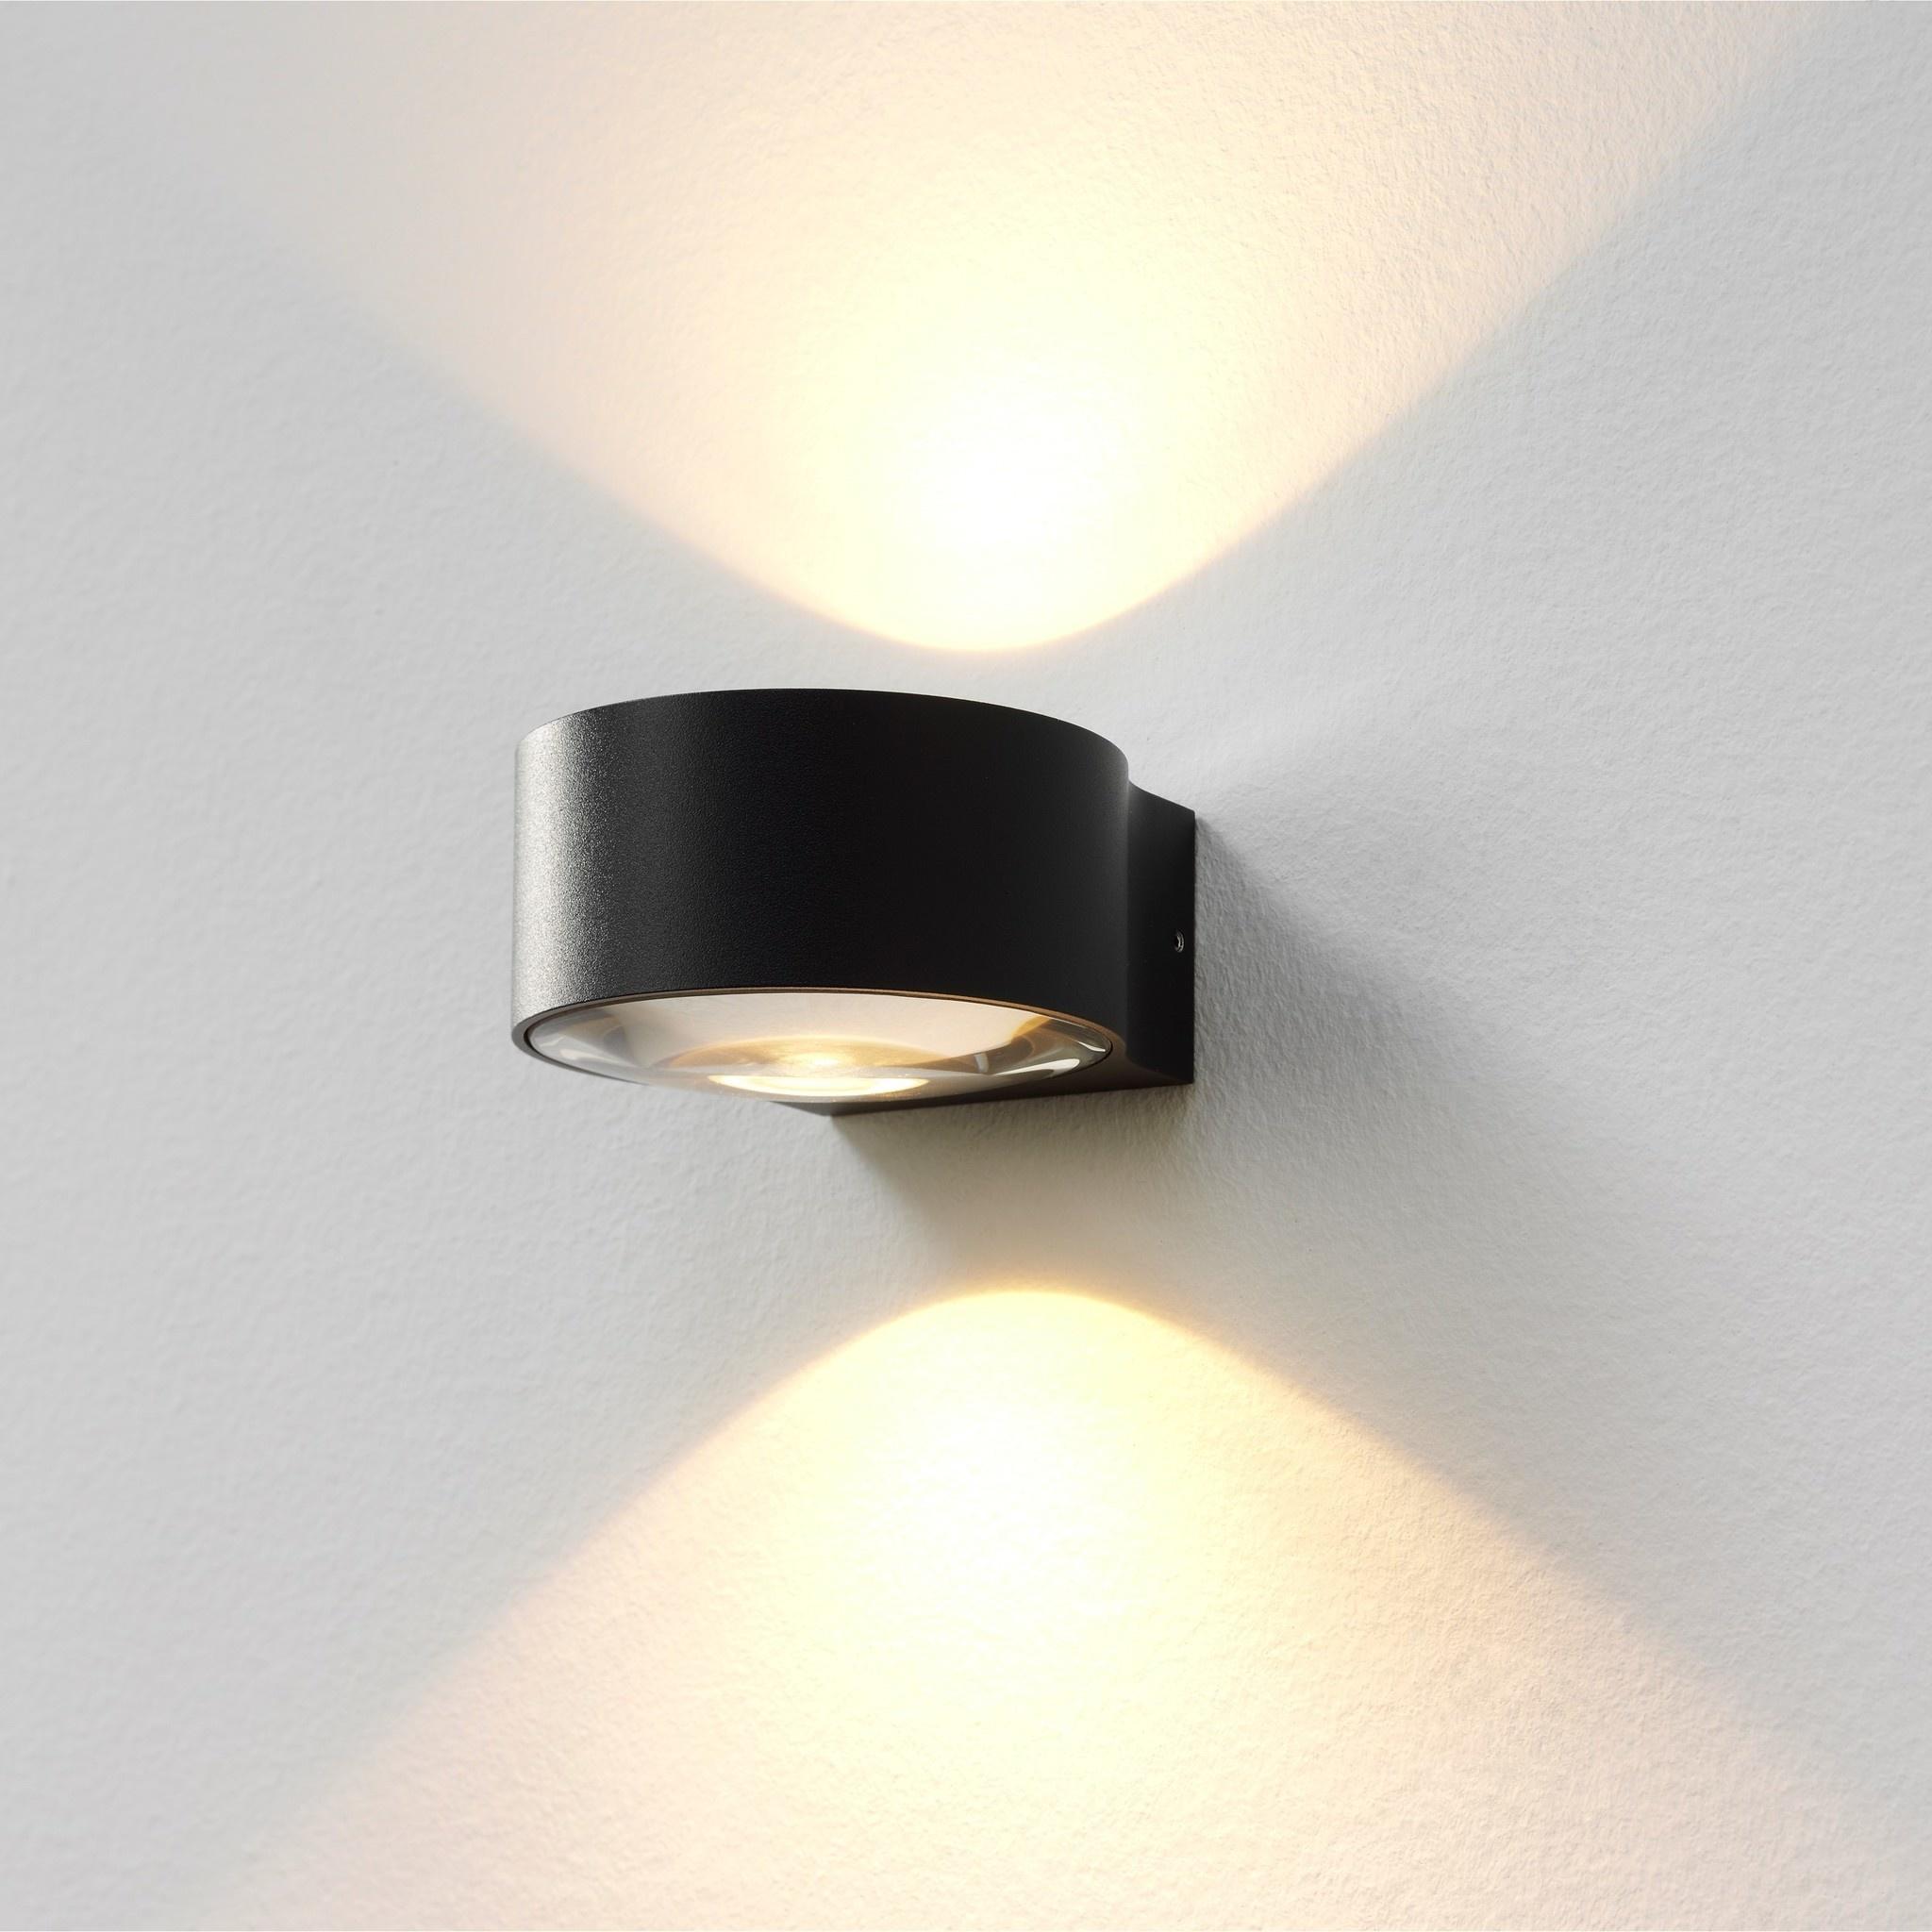 Artdelight Wandlamp Hudson Ø 11 cm antraciet